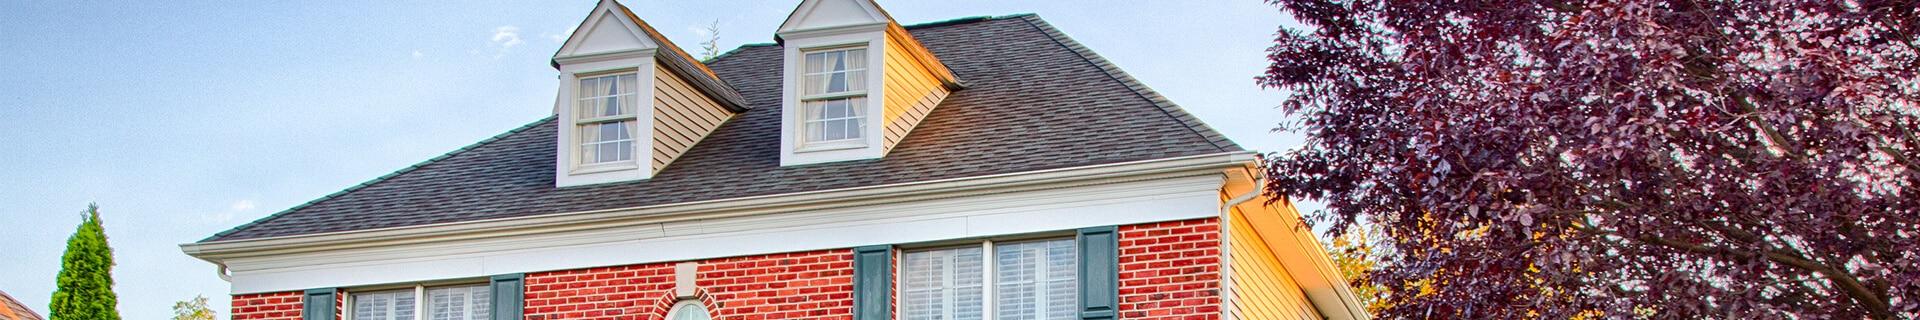 South Windsor Ct Corey Turner Home Improvement